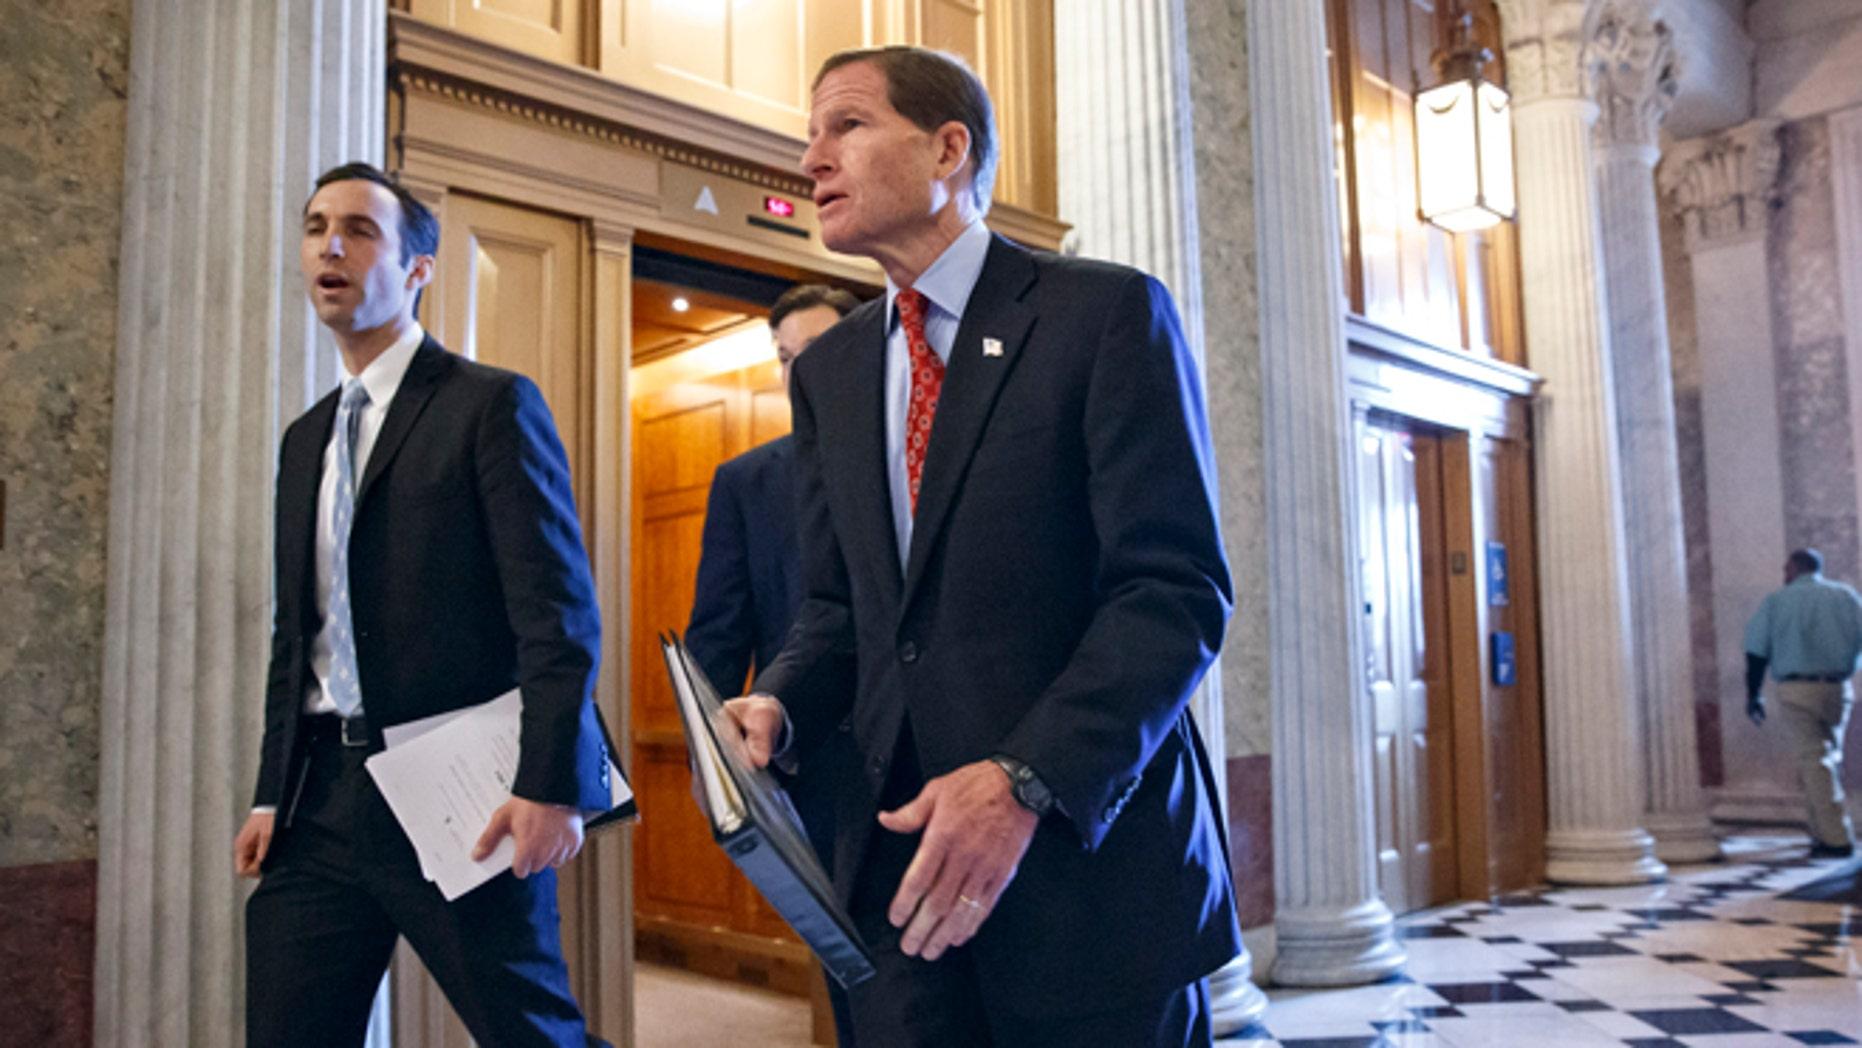 Dec. 18, 2013: Sen. Richard Blumenthal, D-Conn., right, walks to the Senate chamber on Capitol Hill.